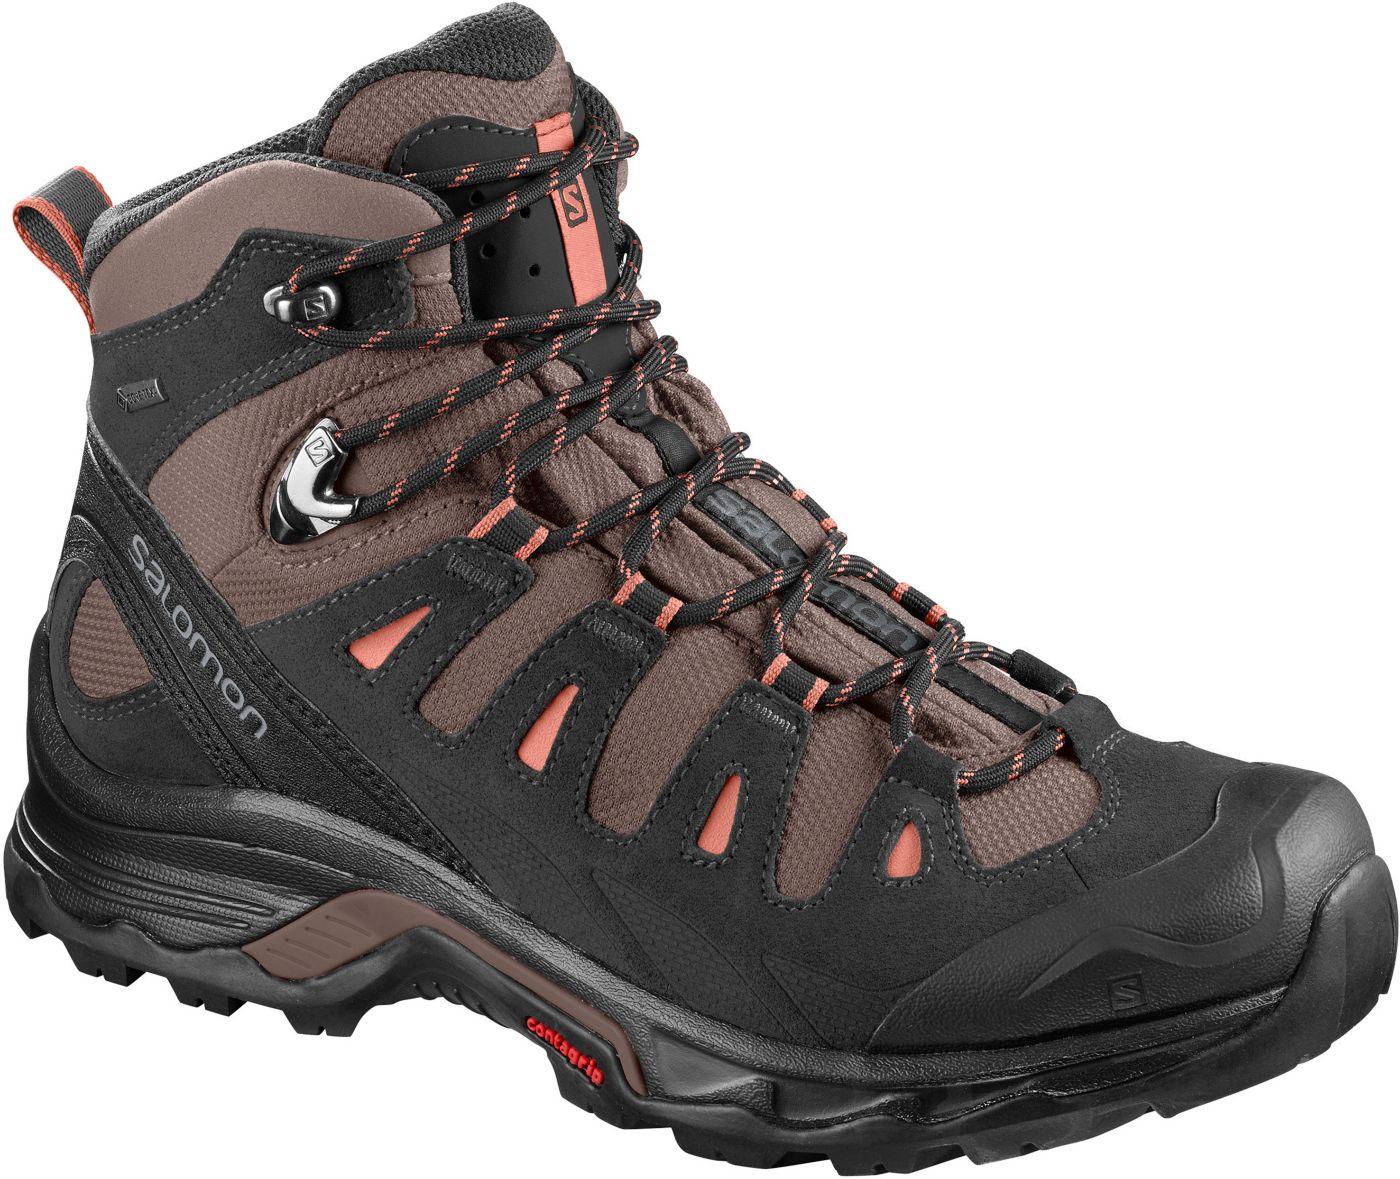 Salomon Women's Quest Prime GTX Waterproof Hiking Boots